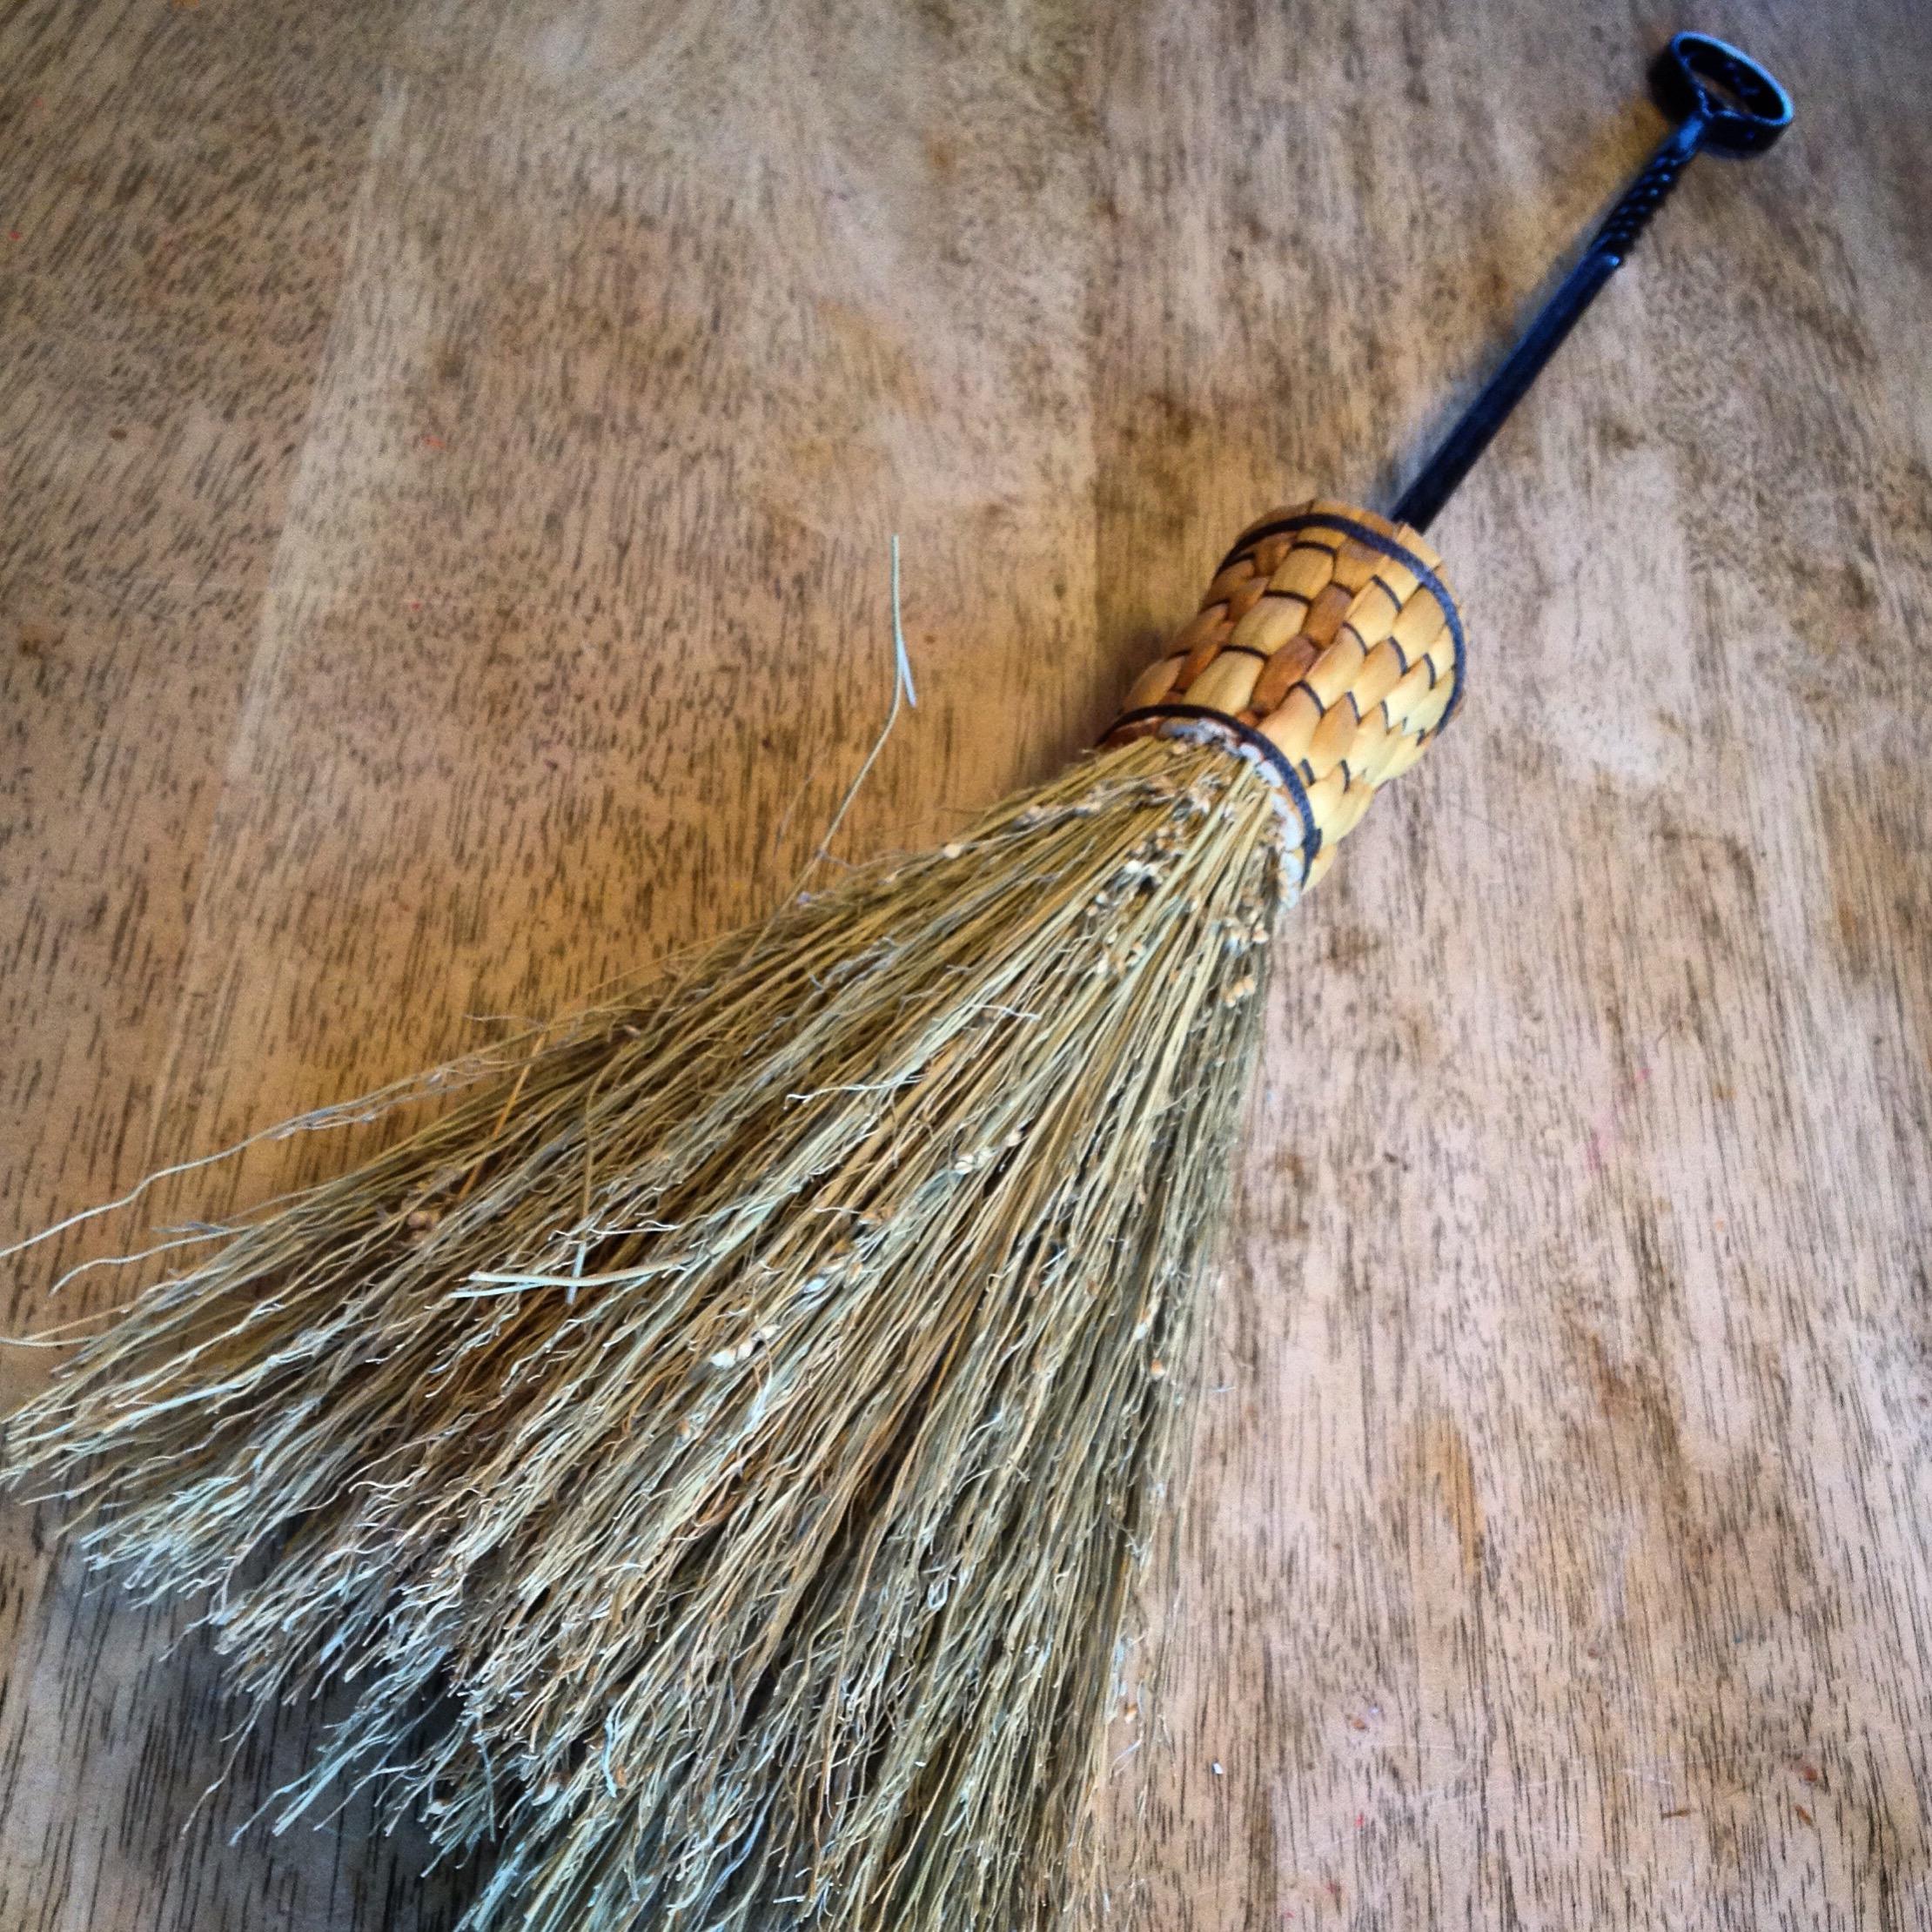 Custom fireplace handmade broom with a hand forged handle